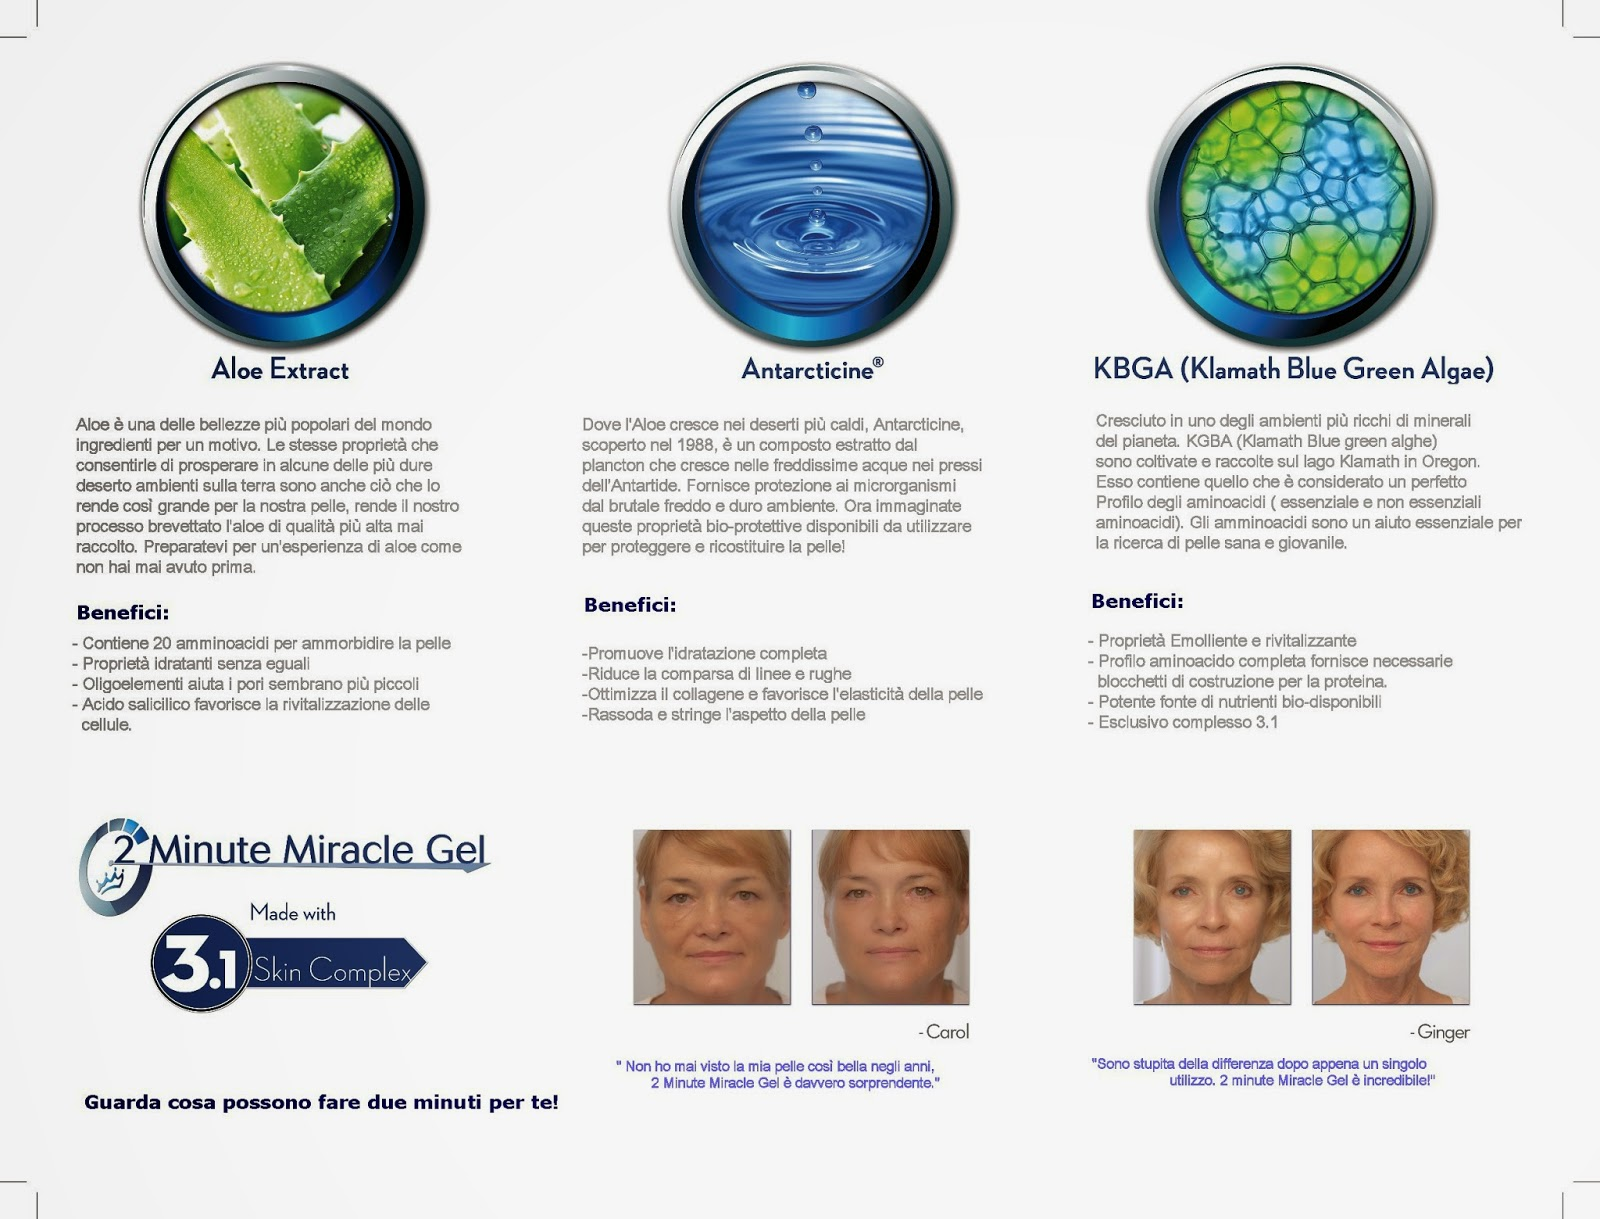 http://howbusinessonline.com/jm-2miracle-gel-head-team/